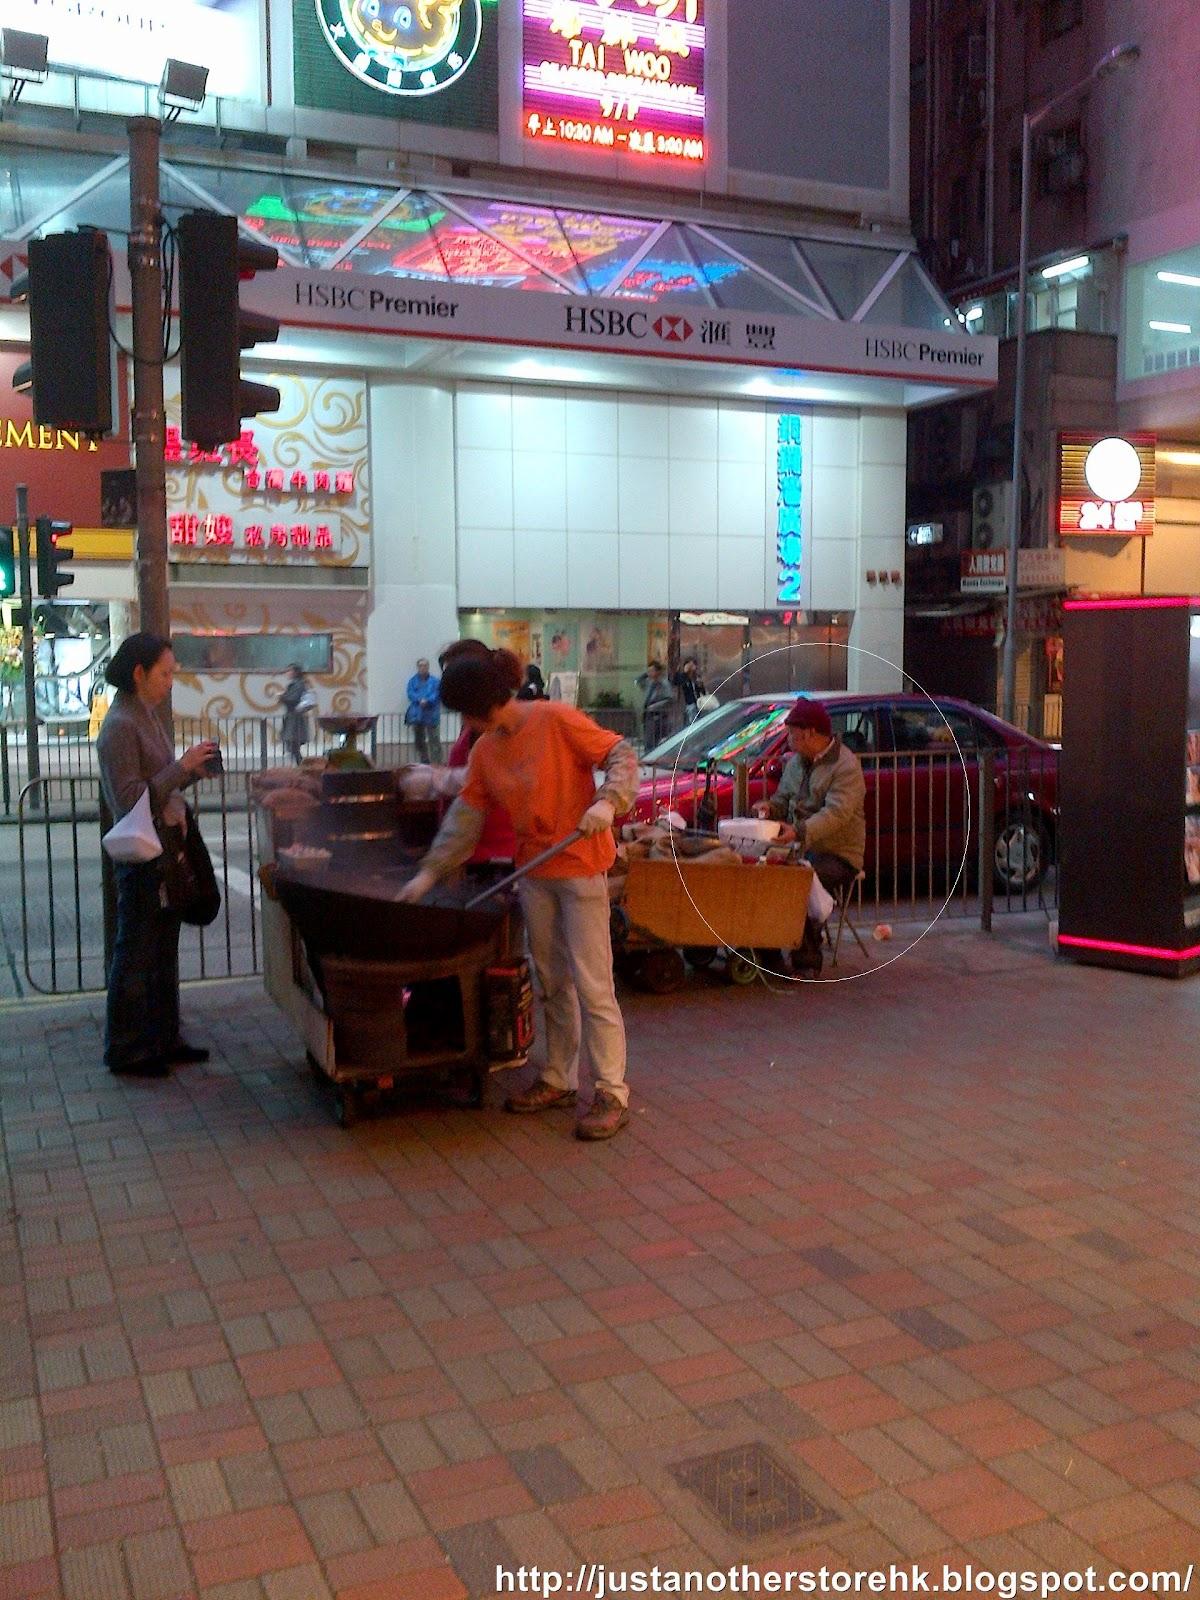 Just Another Store HK: 蕃薯和粟子-驚天動地愛戀過